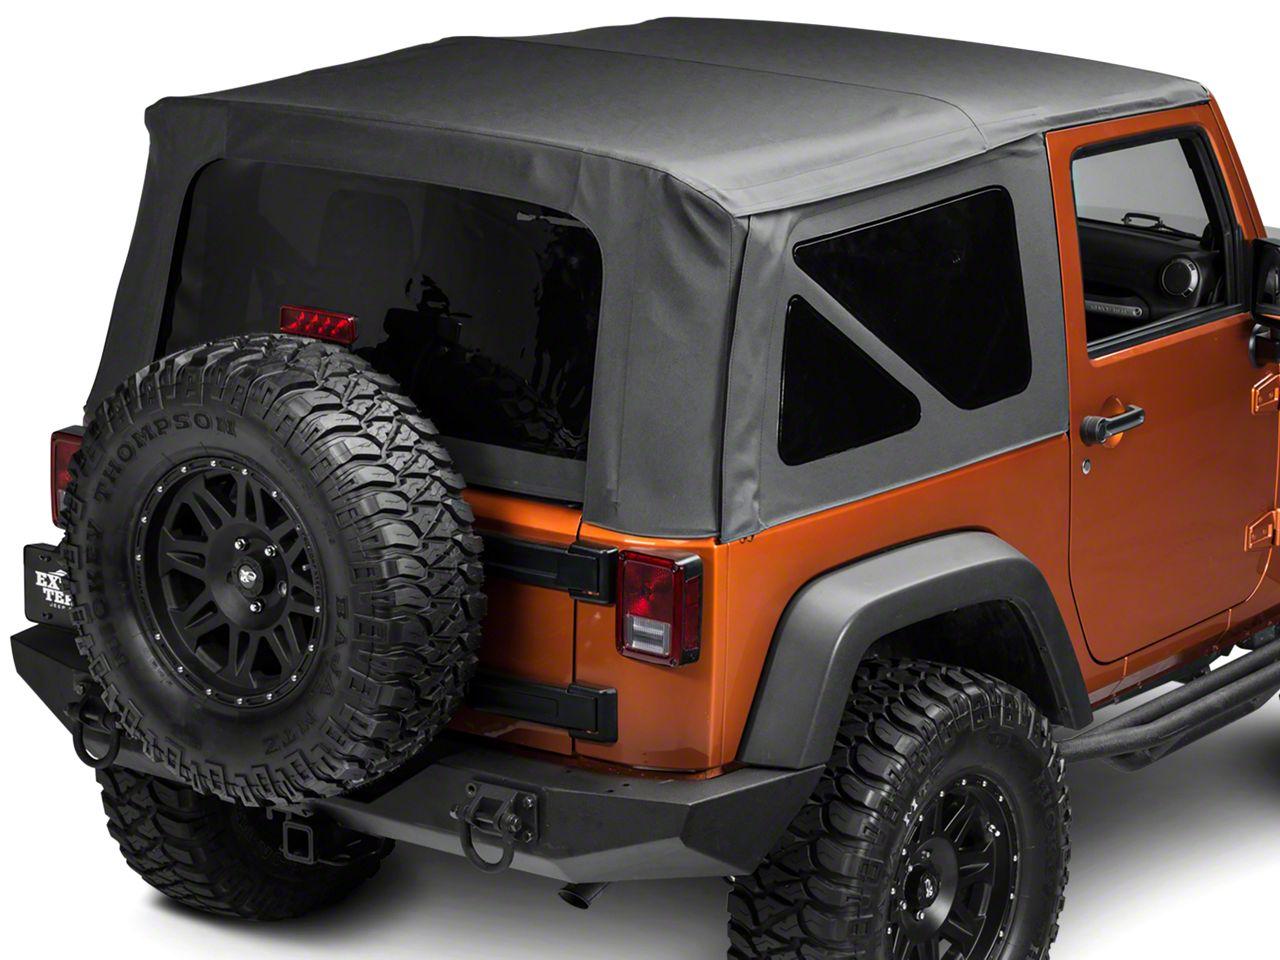 TruShield Replacement Soft Top w/ Tinted Windows - Black Diamond (07-18 Jeep Wrangler JK 2 Door)